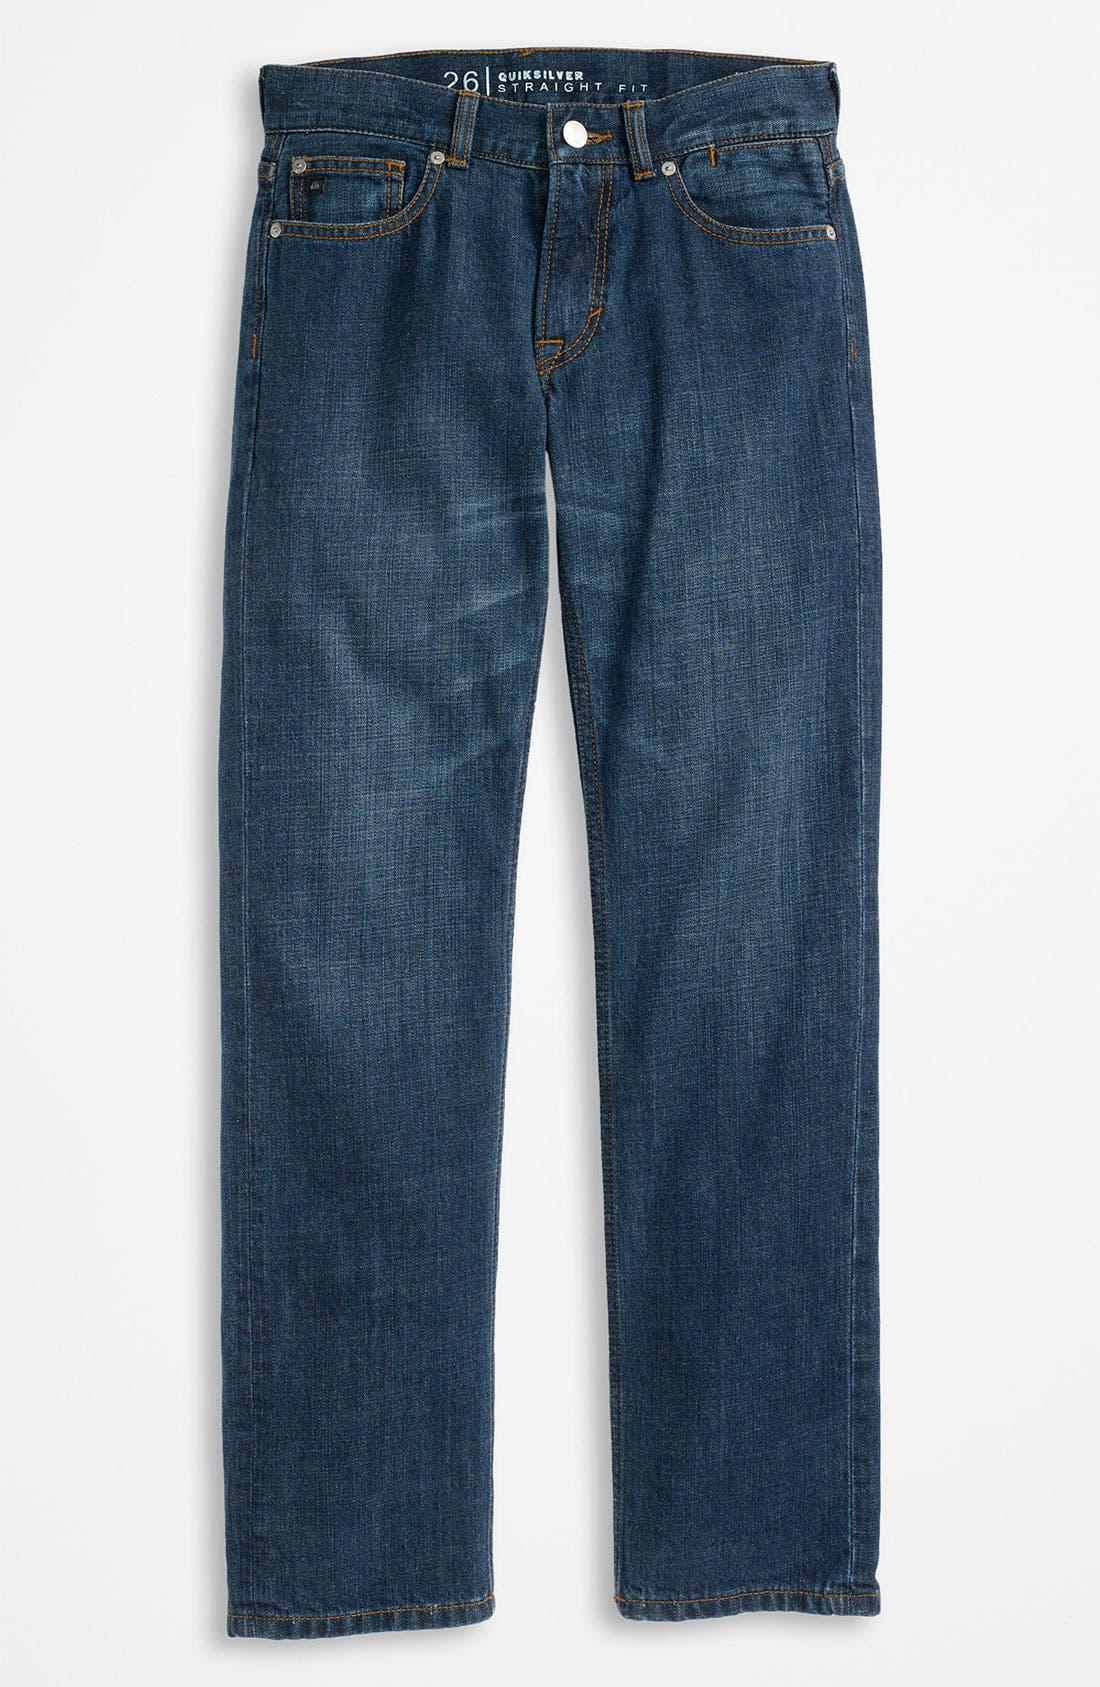 Alternate Image 2  - Quiksilver 'Revolver' Jeans (Little Boys)